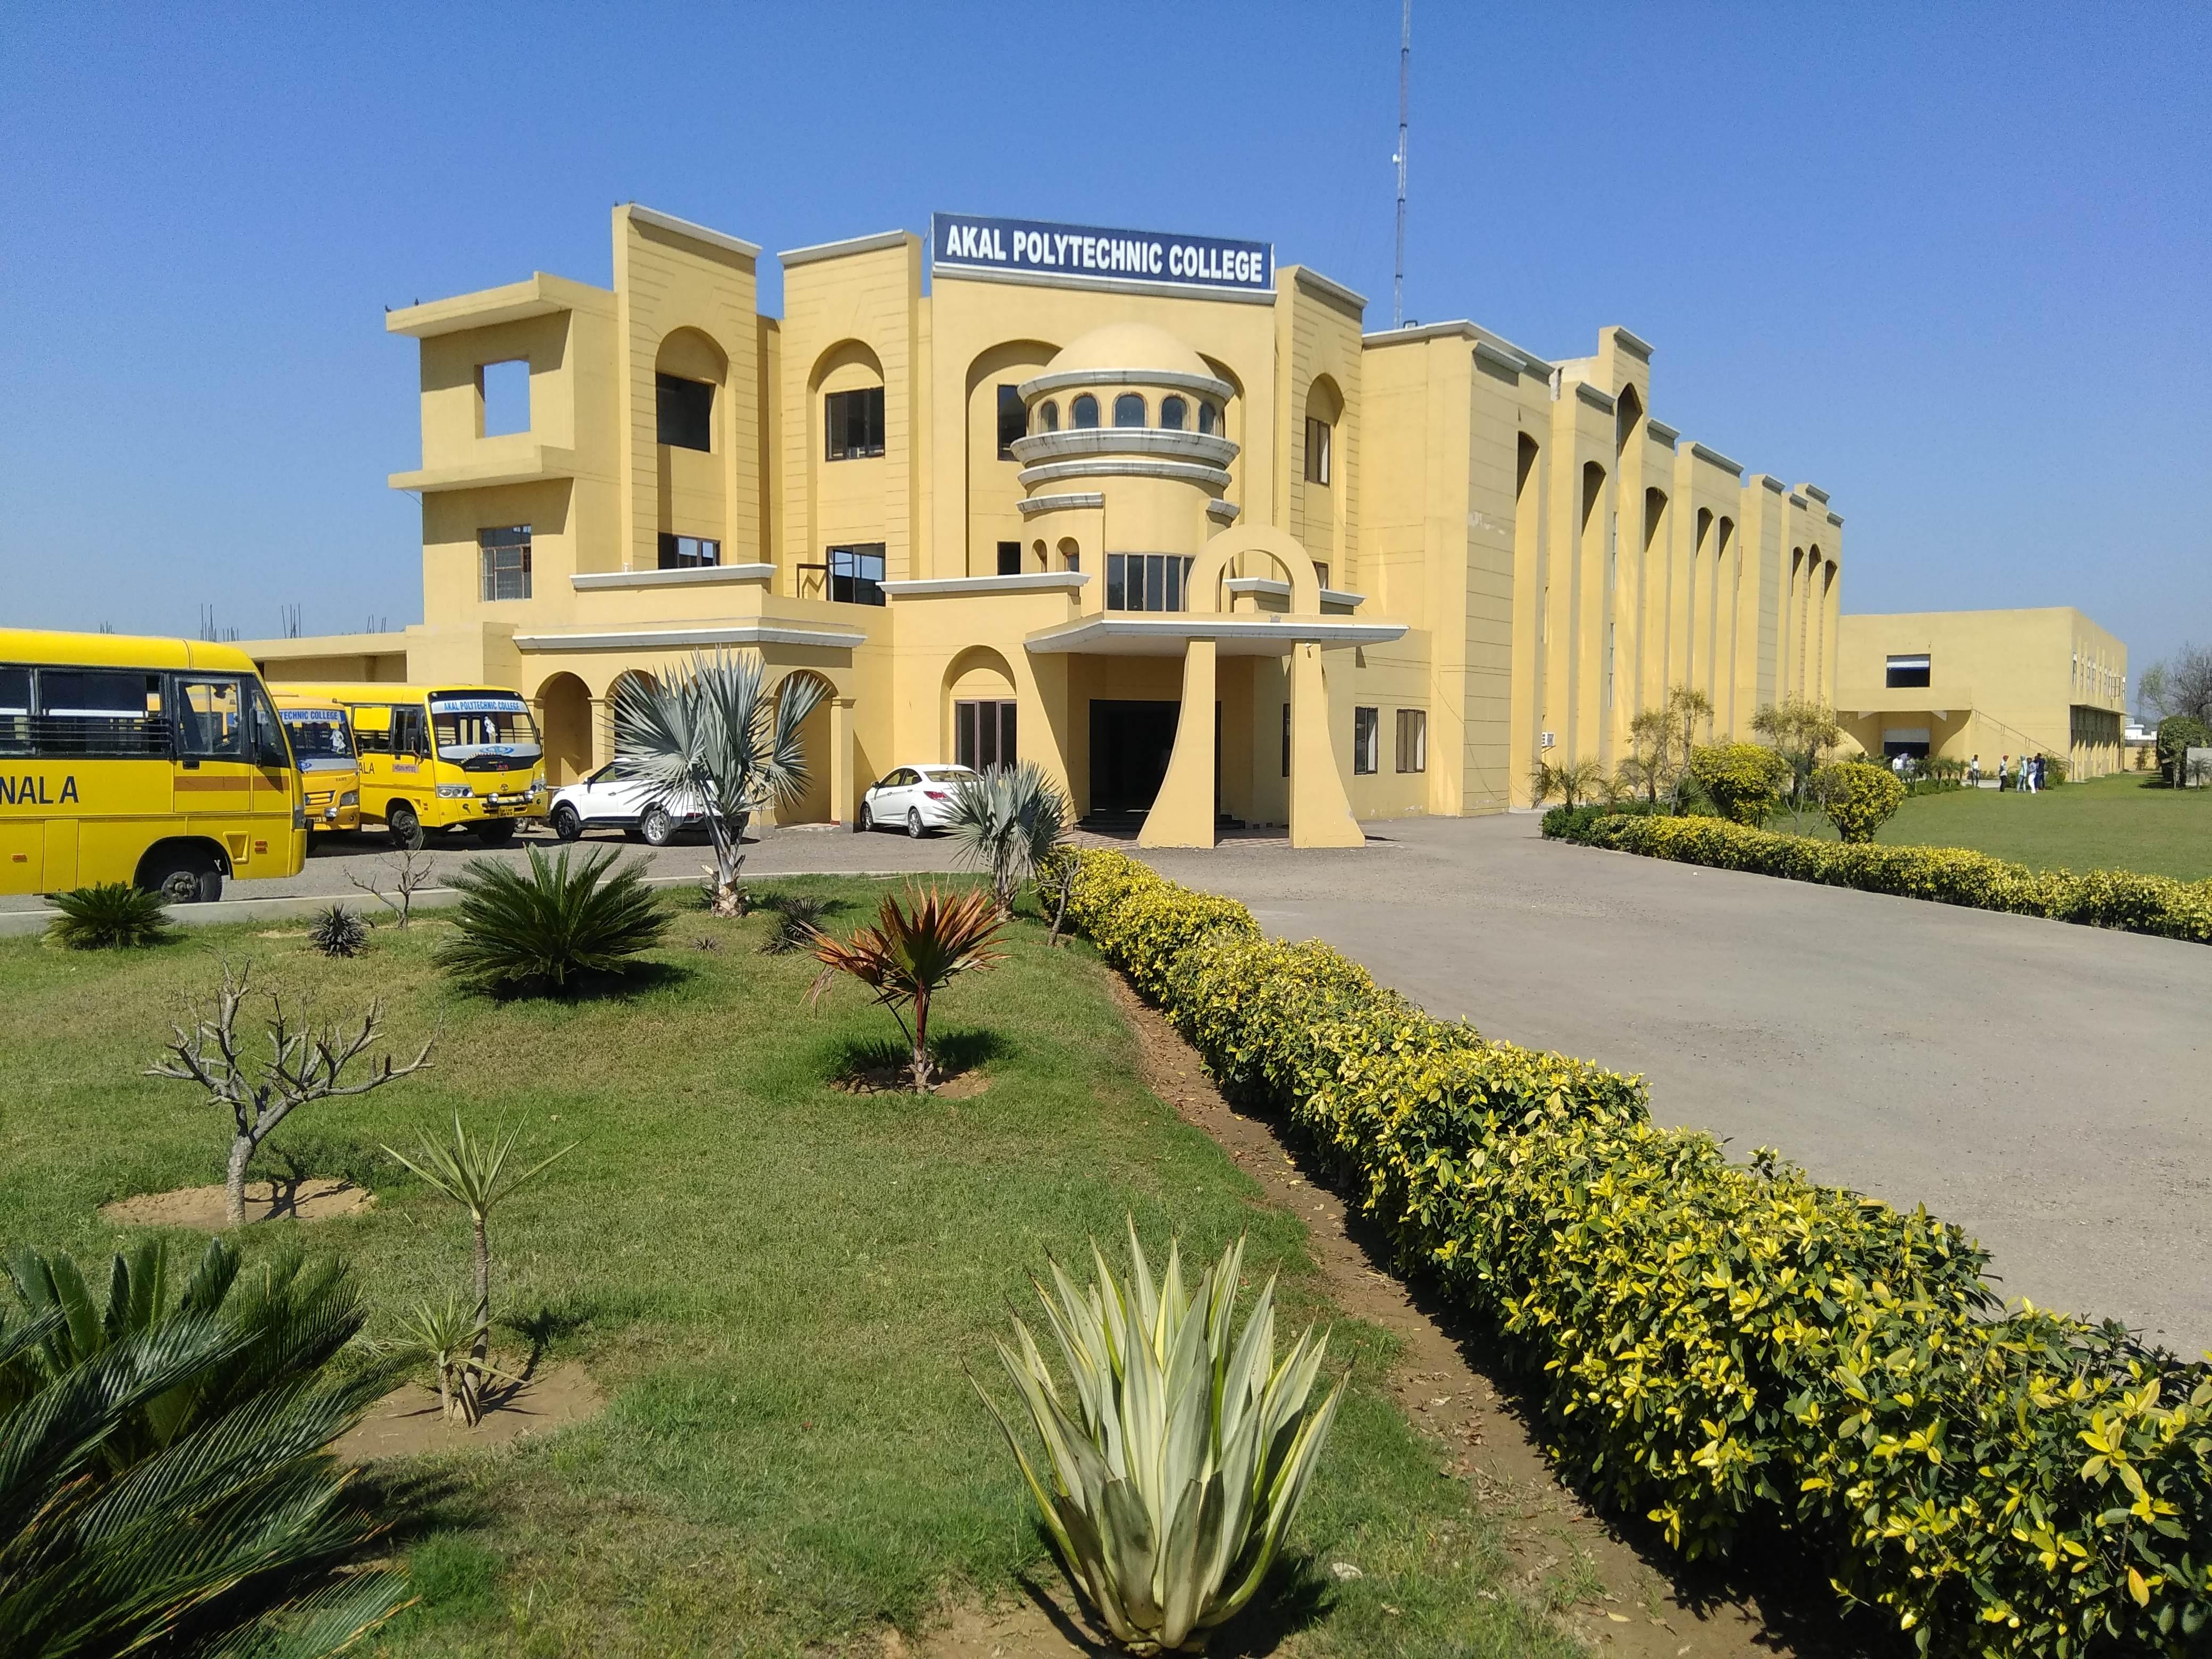 Akal Polytechnic College